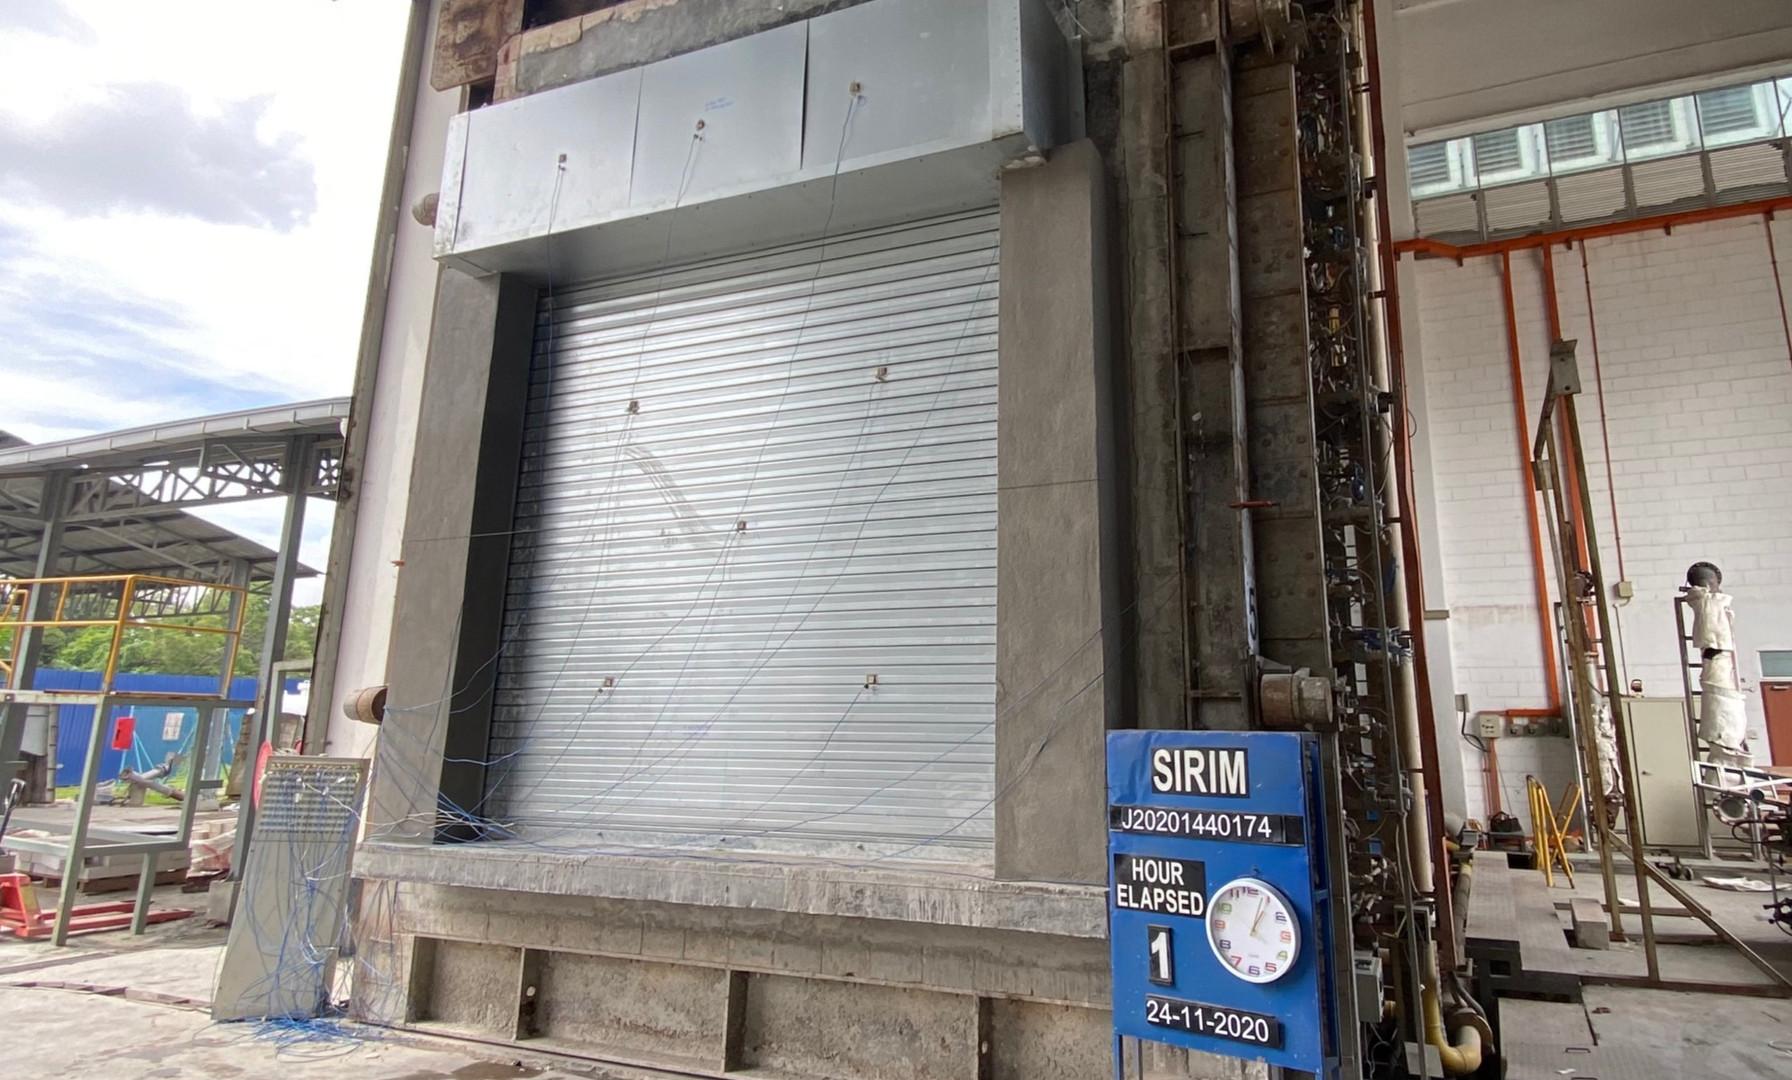 Malaysia Insulated Fire Shutter 1 Hour